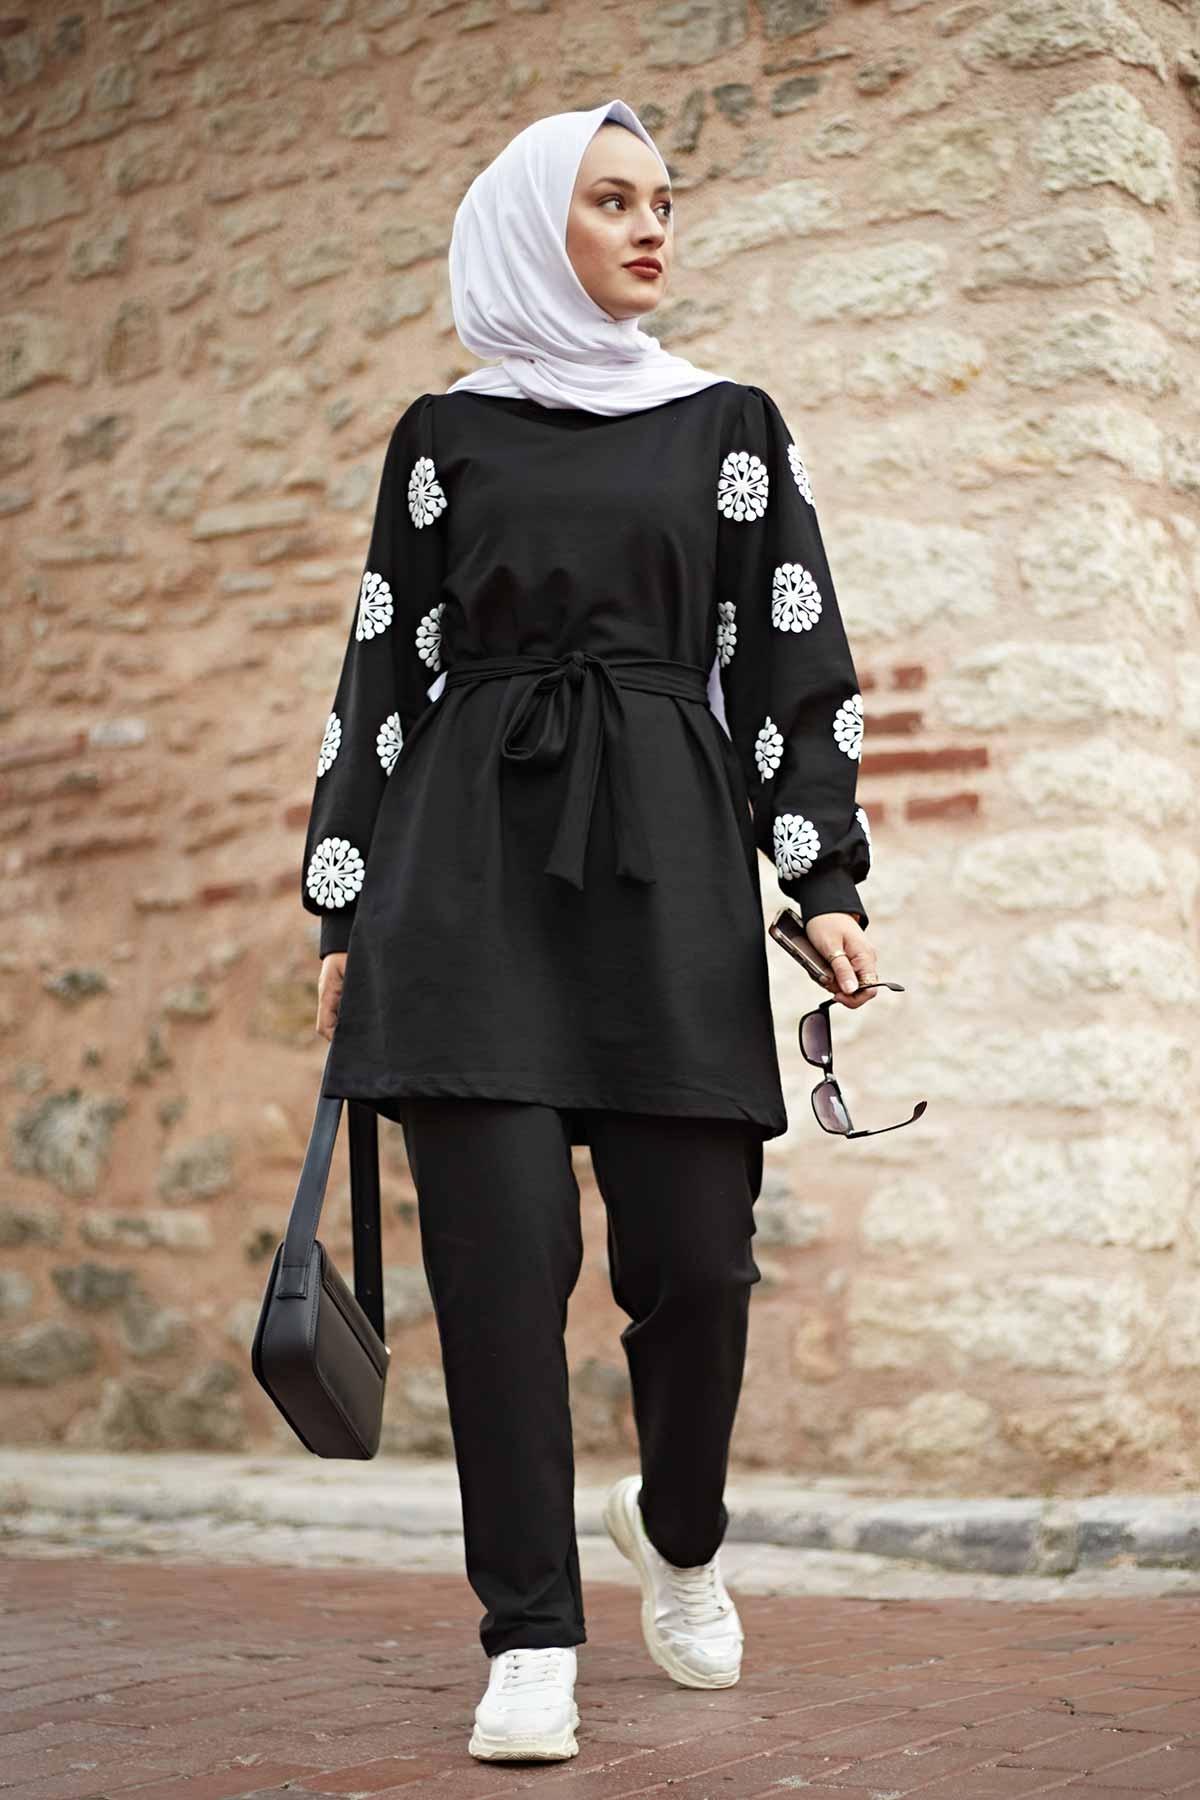 Dubai, Turkey Kaftan Abaya Muslim Robe Apparel Clothing Dresses Vestido Islamic hijab Muslim scraft Top arabic american apparel